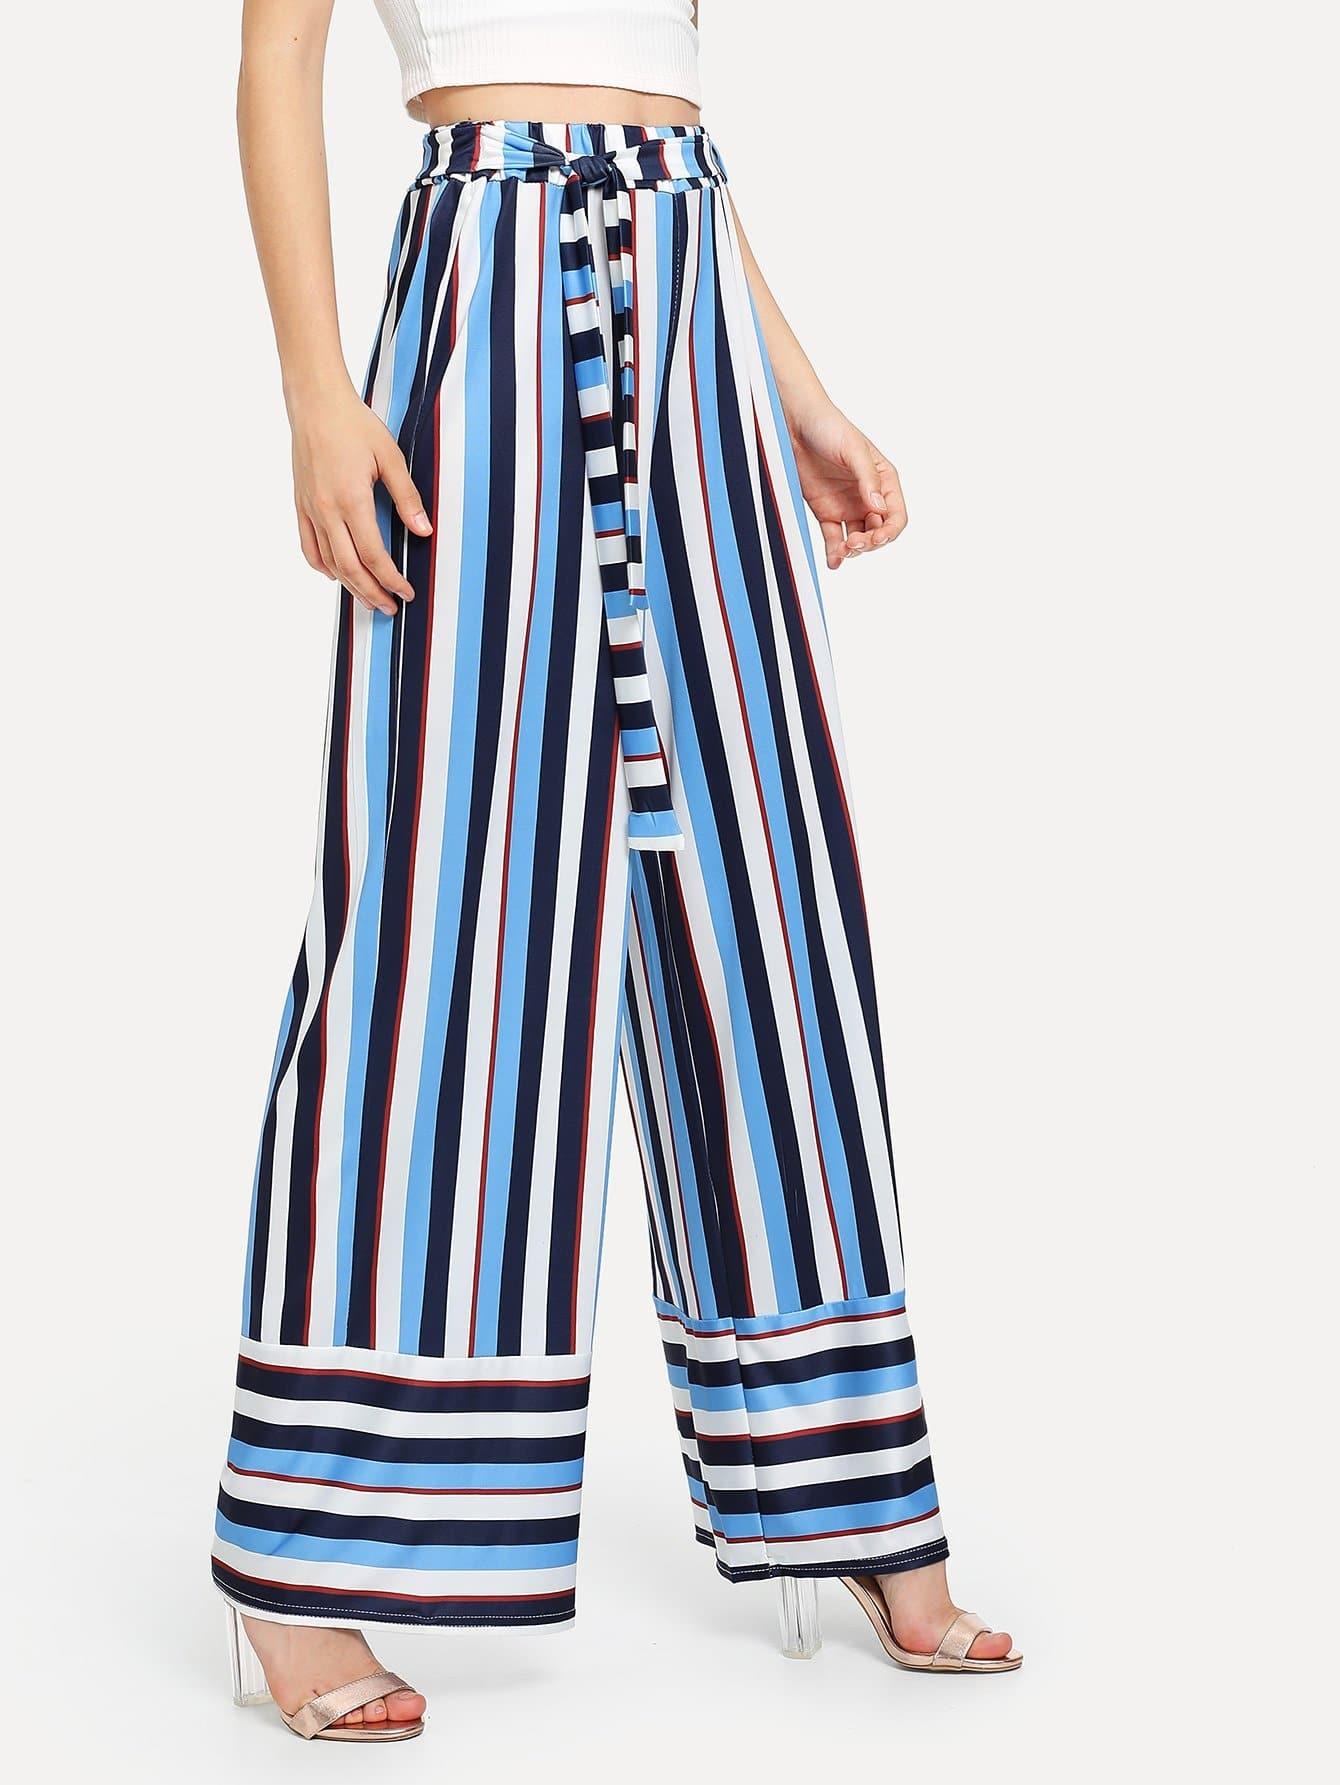 Self Tie Waist Striped Wide Leg Pants striped self tie wide leg pants